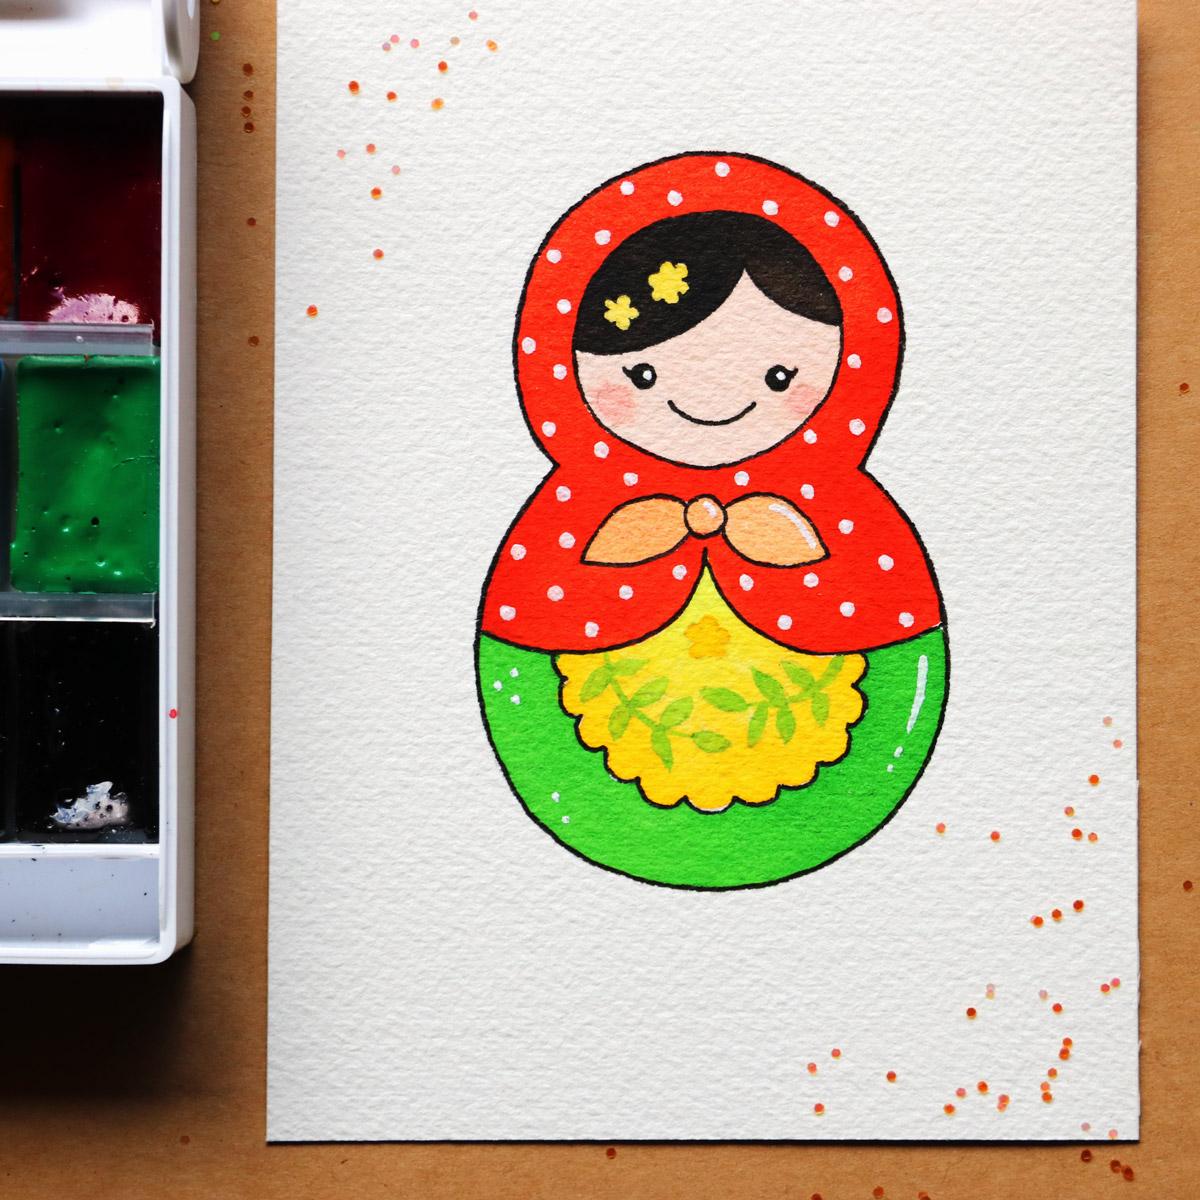 How to draw kawaii matryoshka doll step-by-step